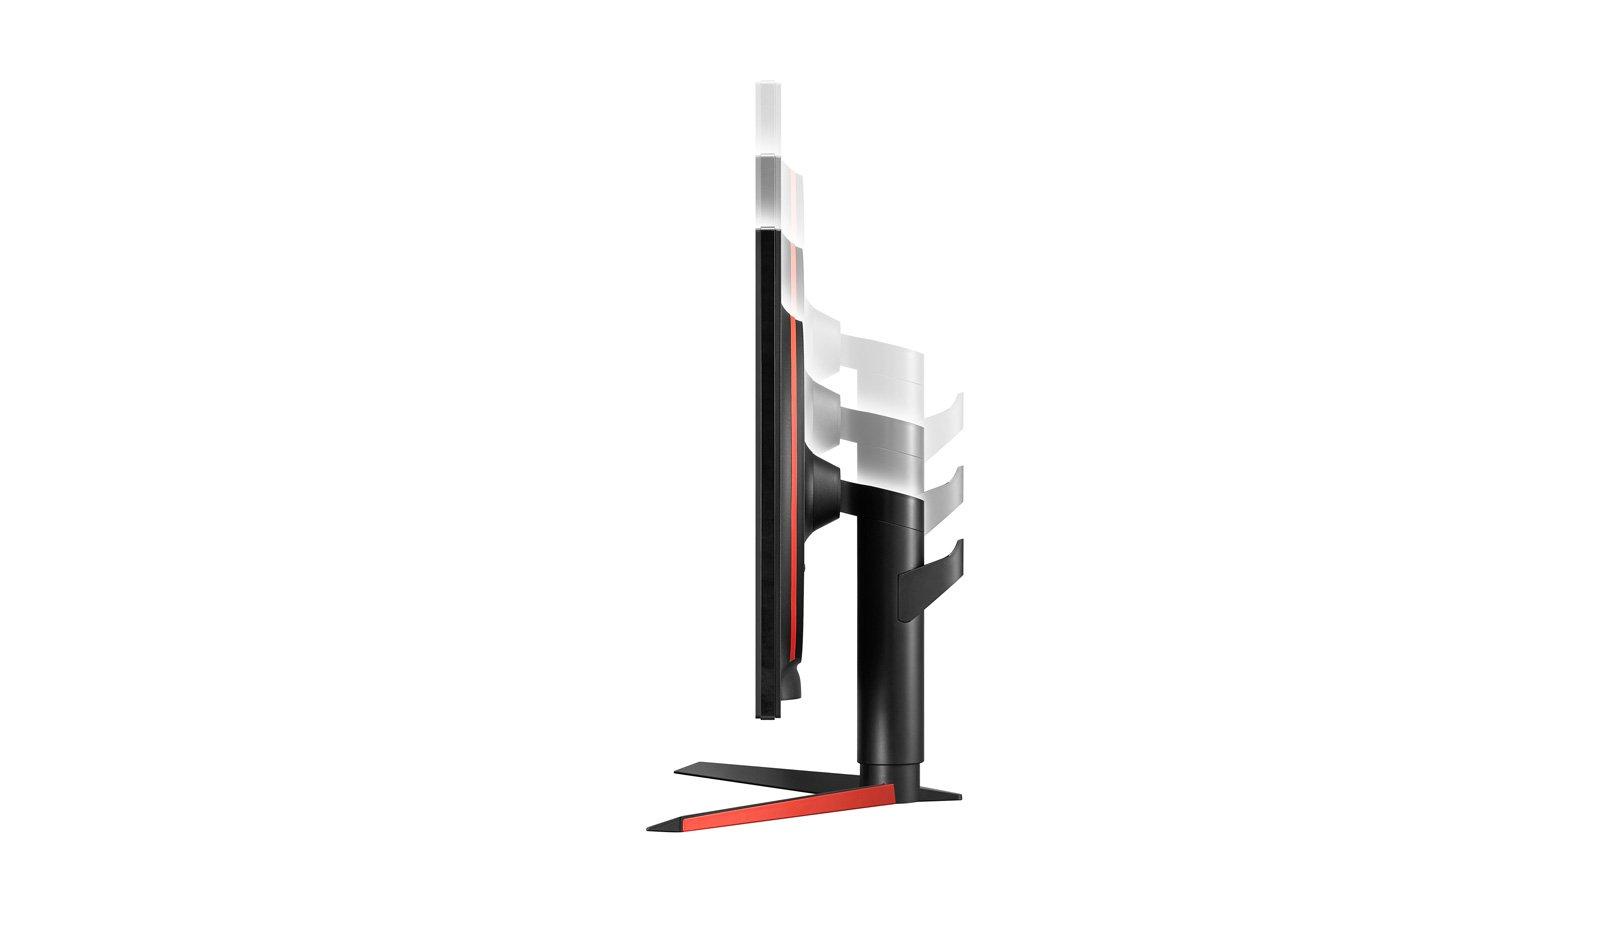 "( TN 27"" 240Hz ) LG 27GK750F-B - Chuyên Gaming | Freesync"